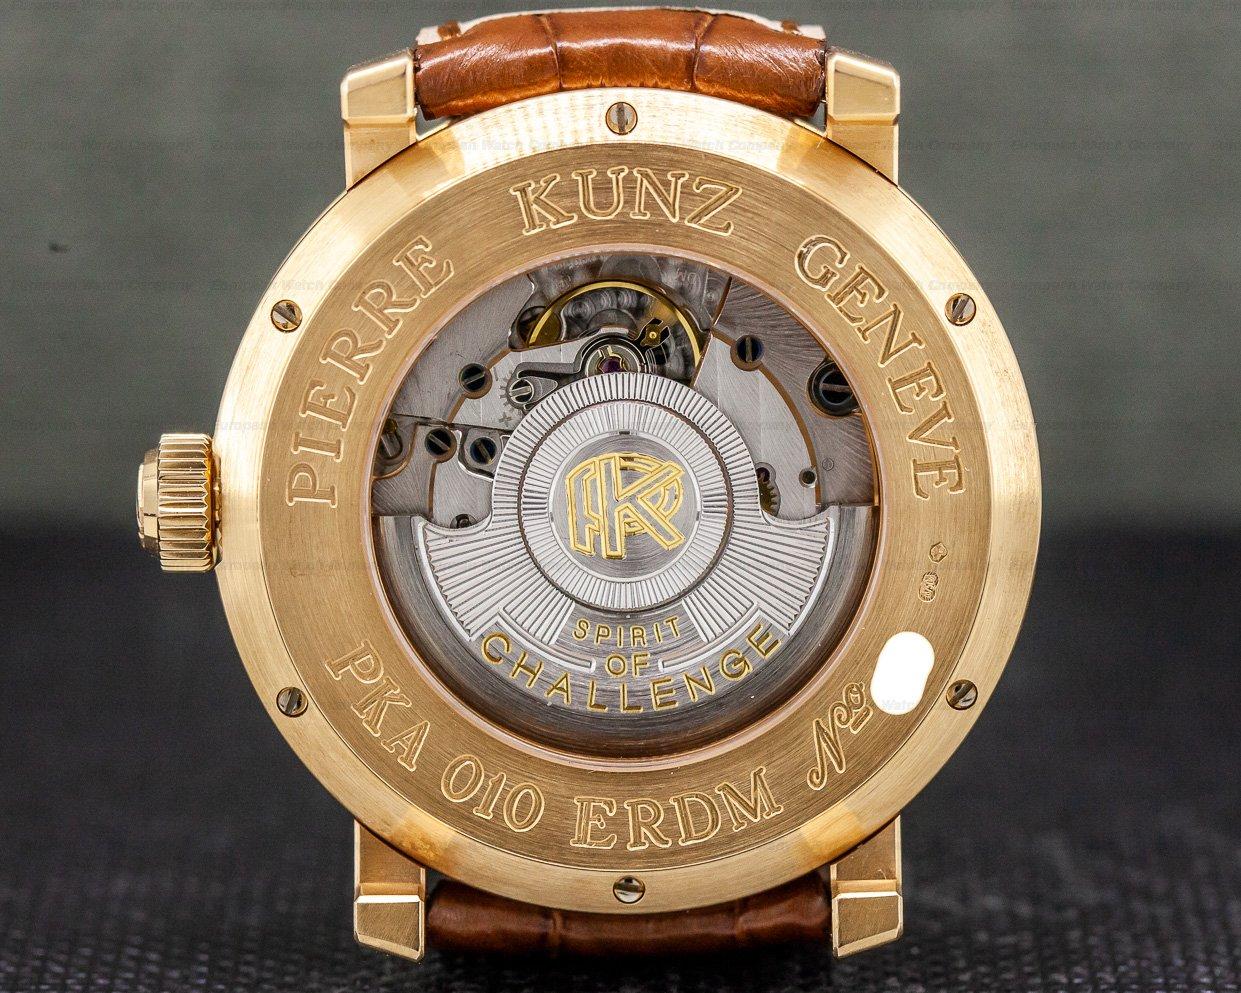 Pierre Kunz PKA 010 ERDM Spirit of Challenge Rose Gold Equation Du Temps